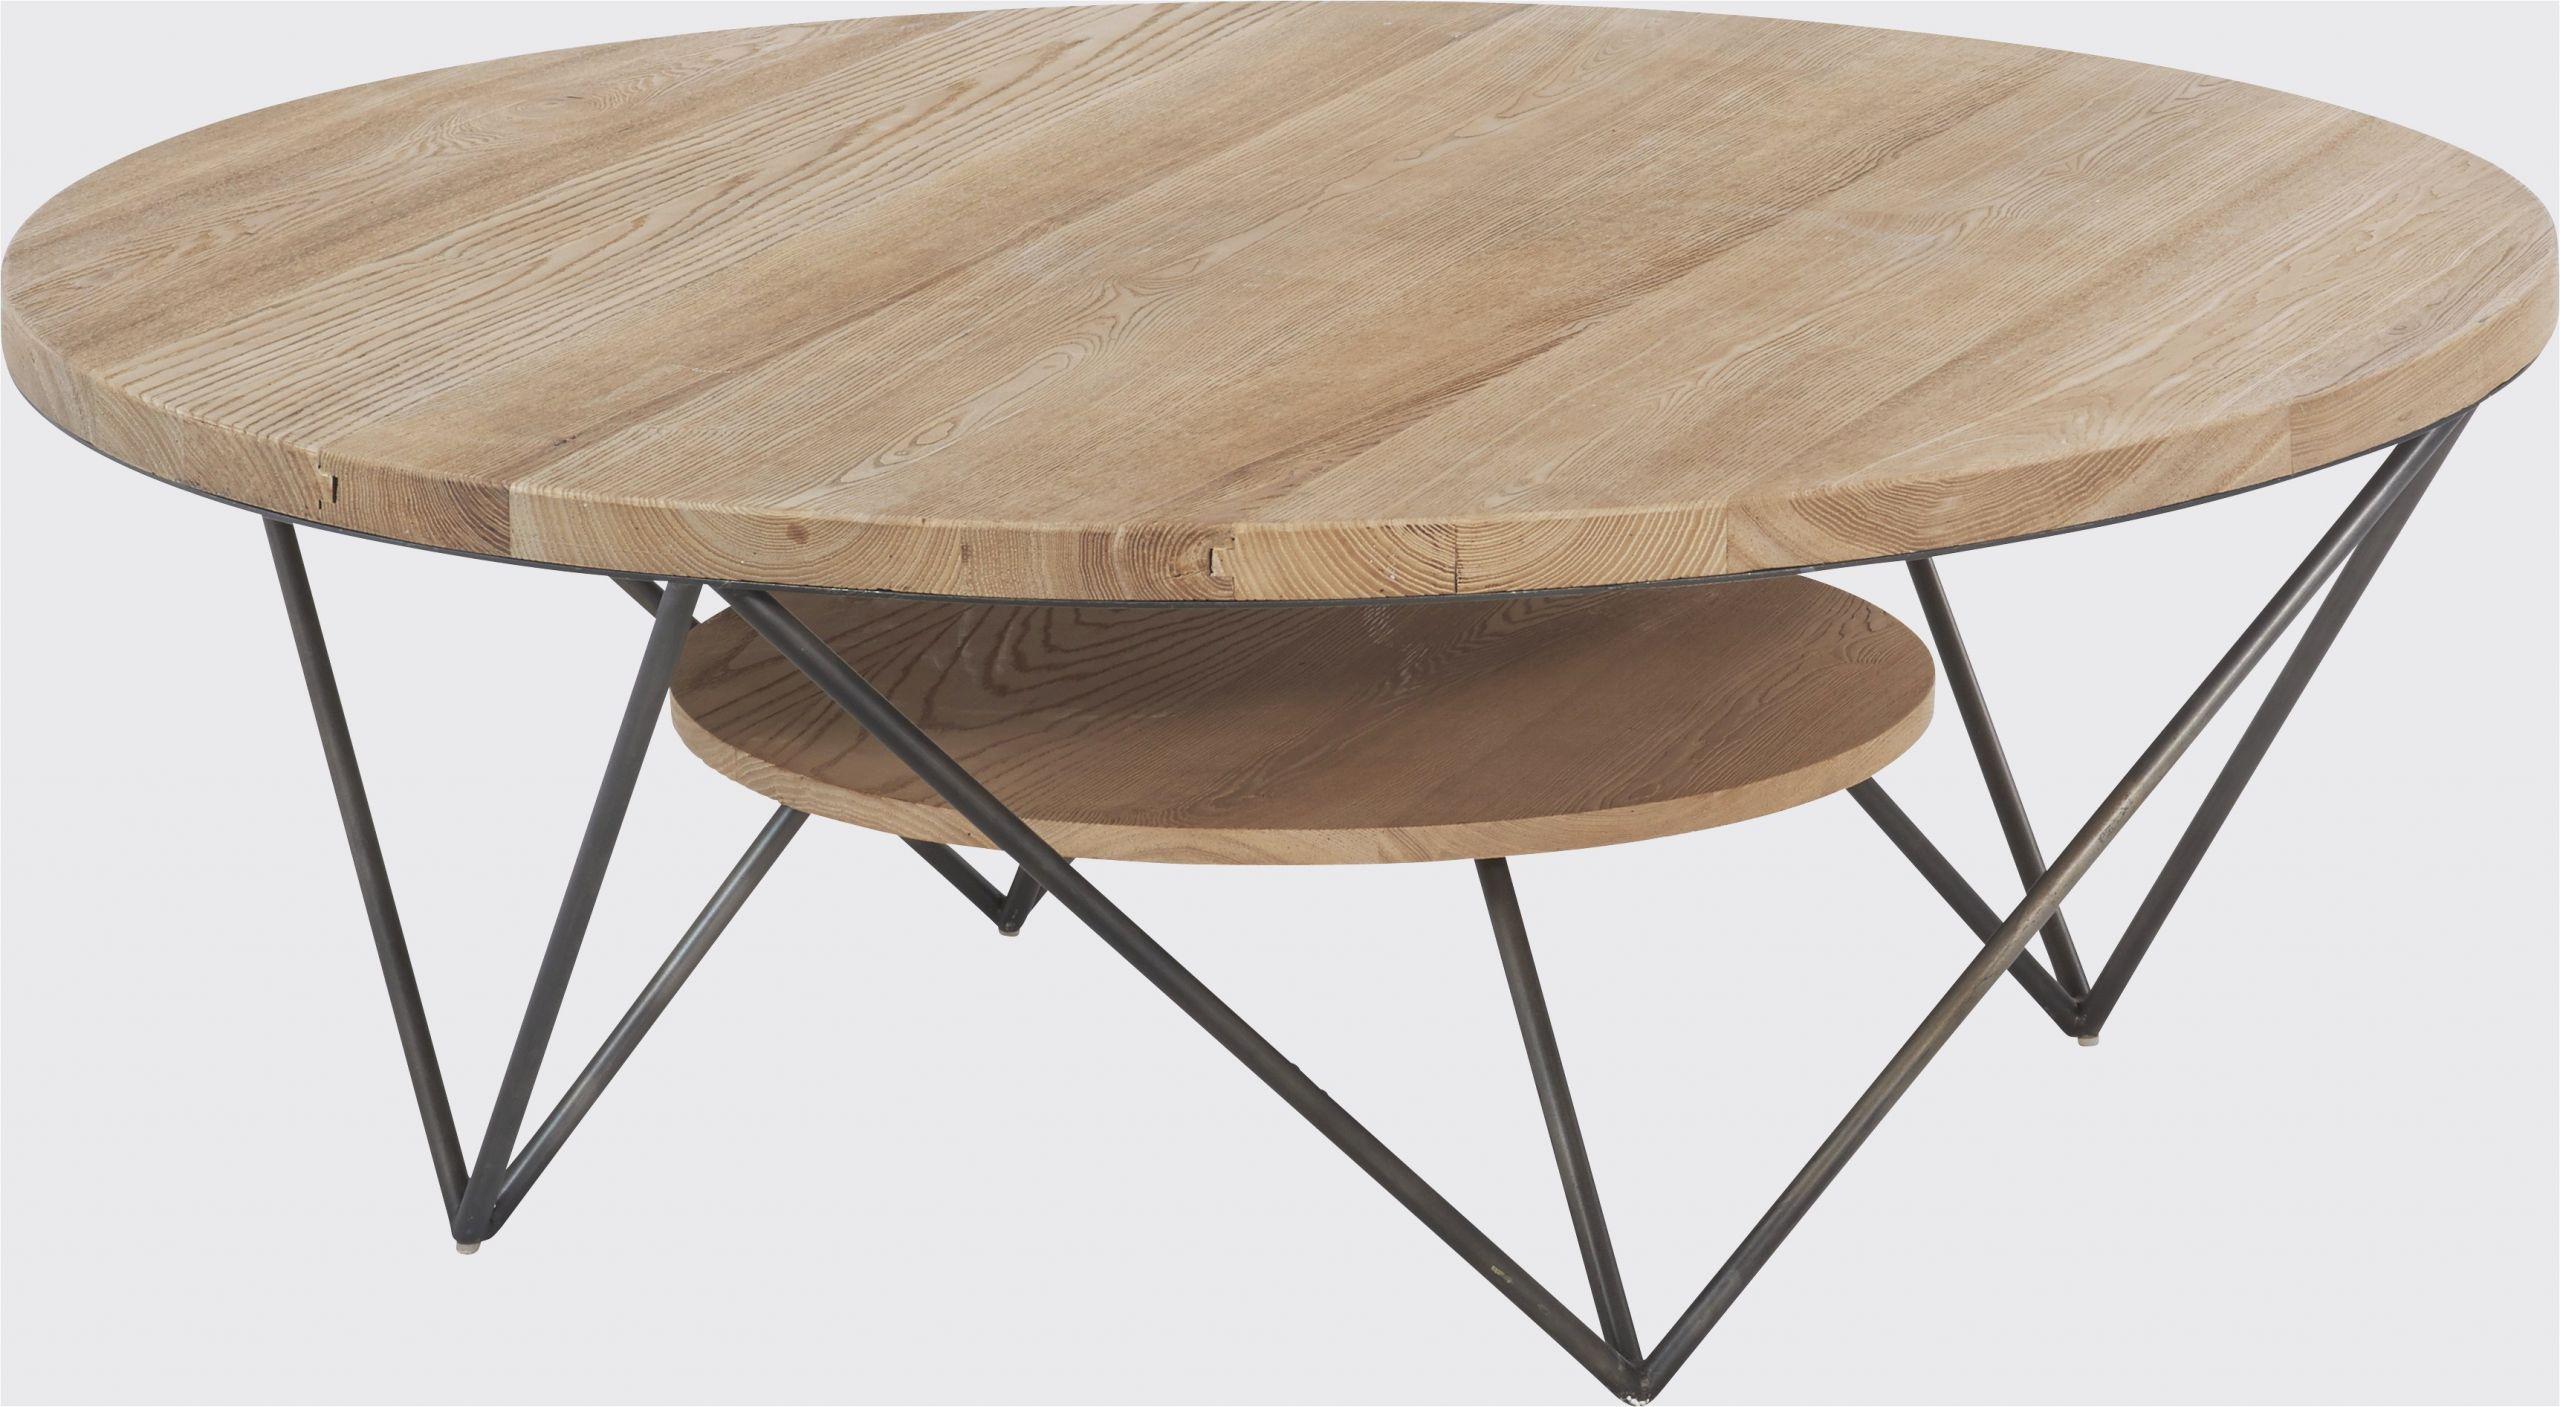 table jardin alinea inspire table alinea bois table bois brut elegant table bois 0d archives of table jardin alinea